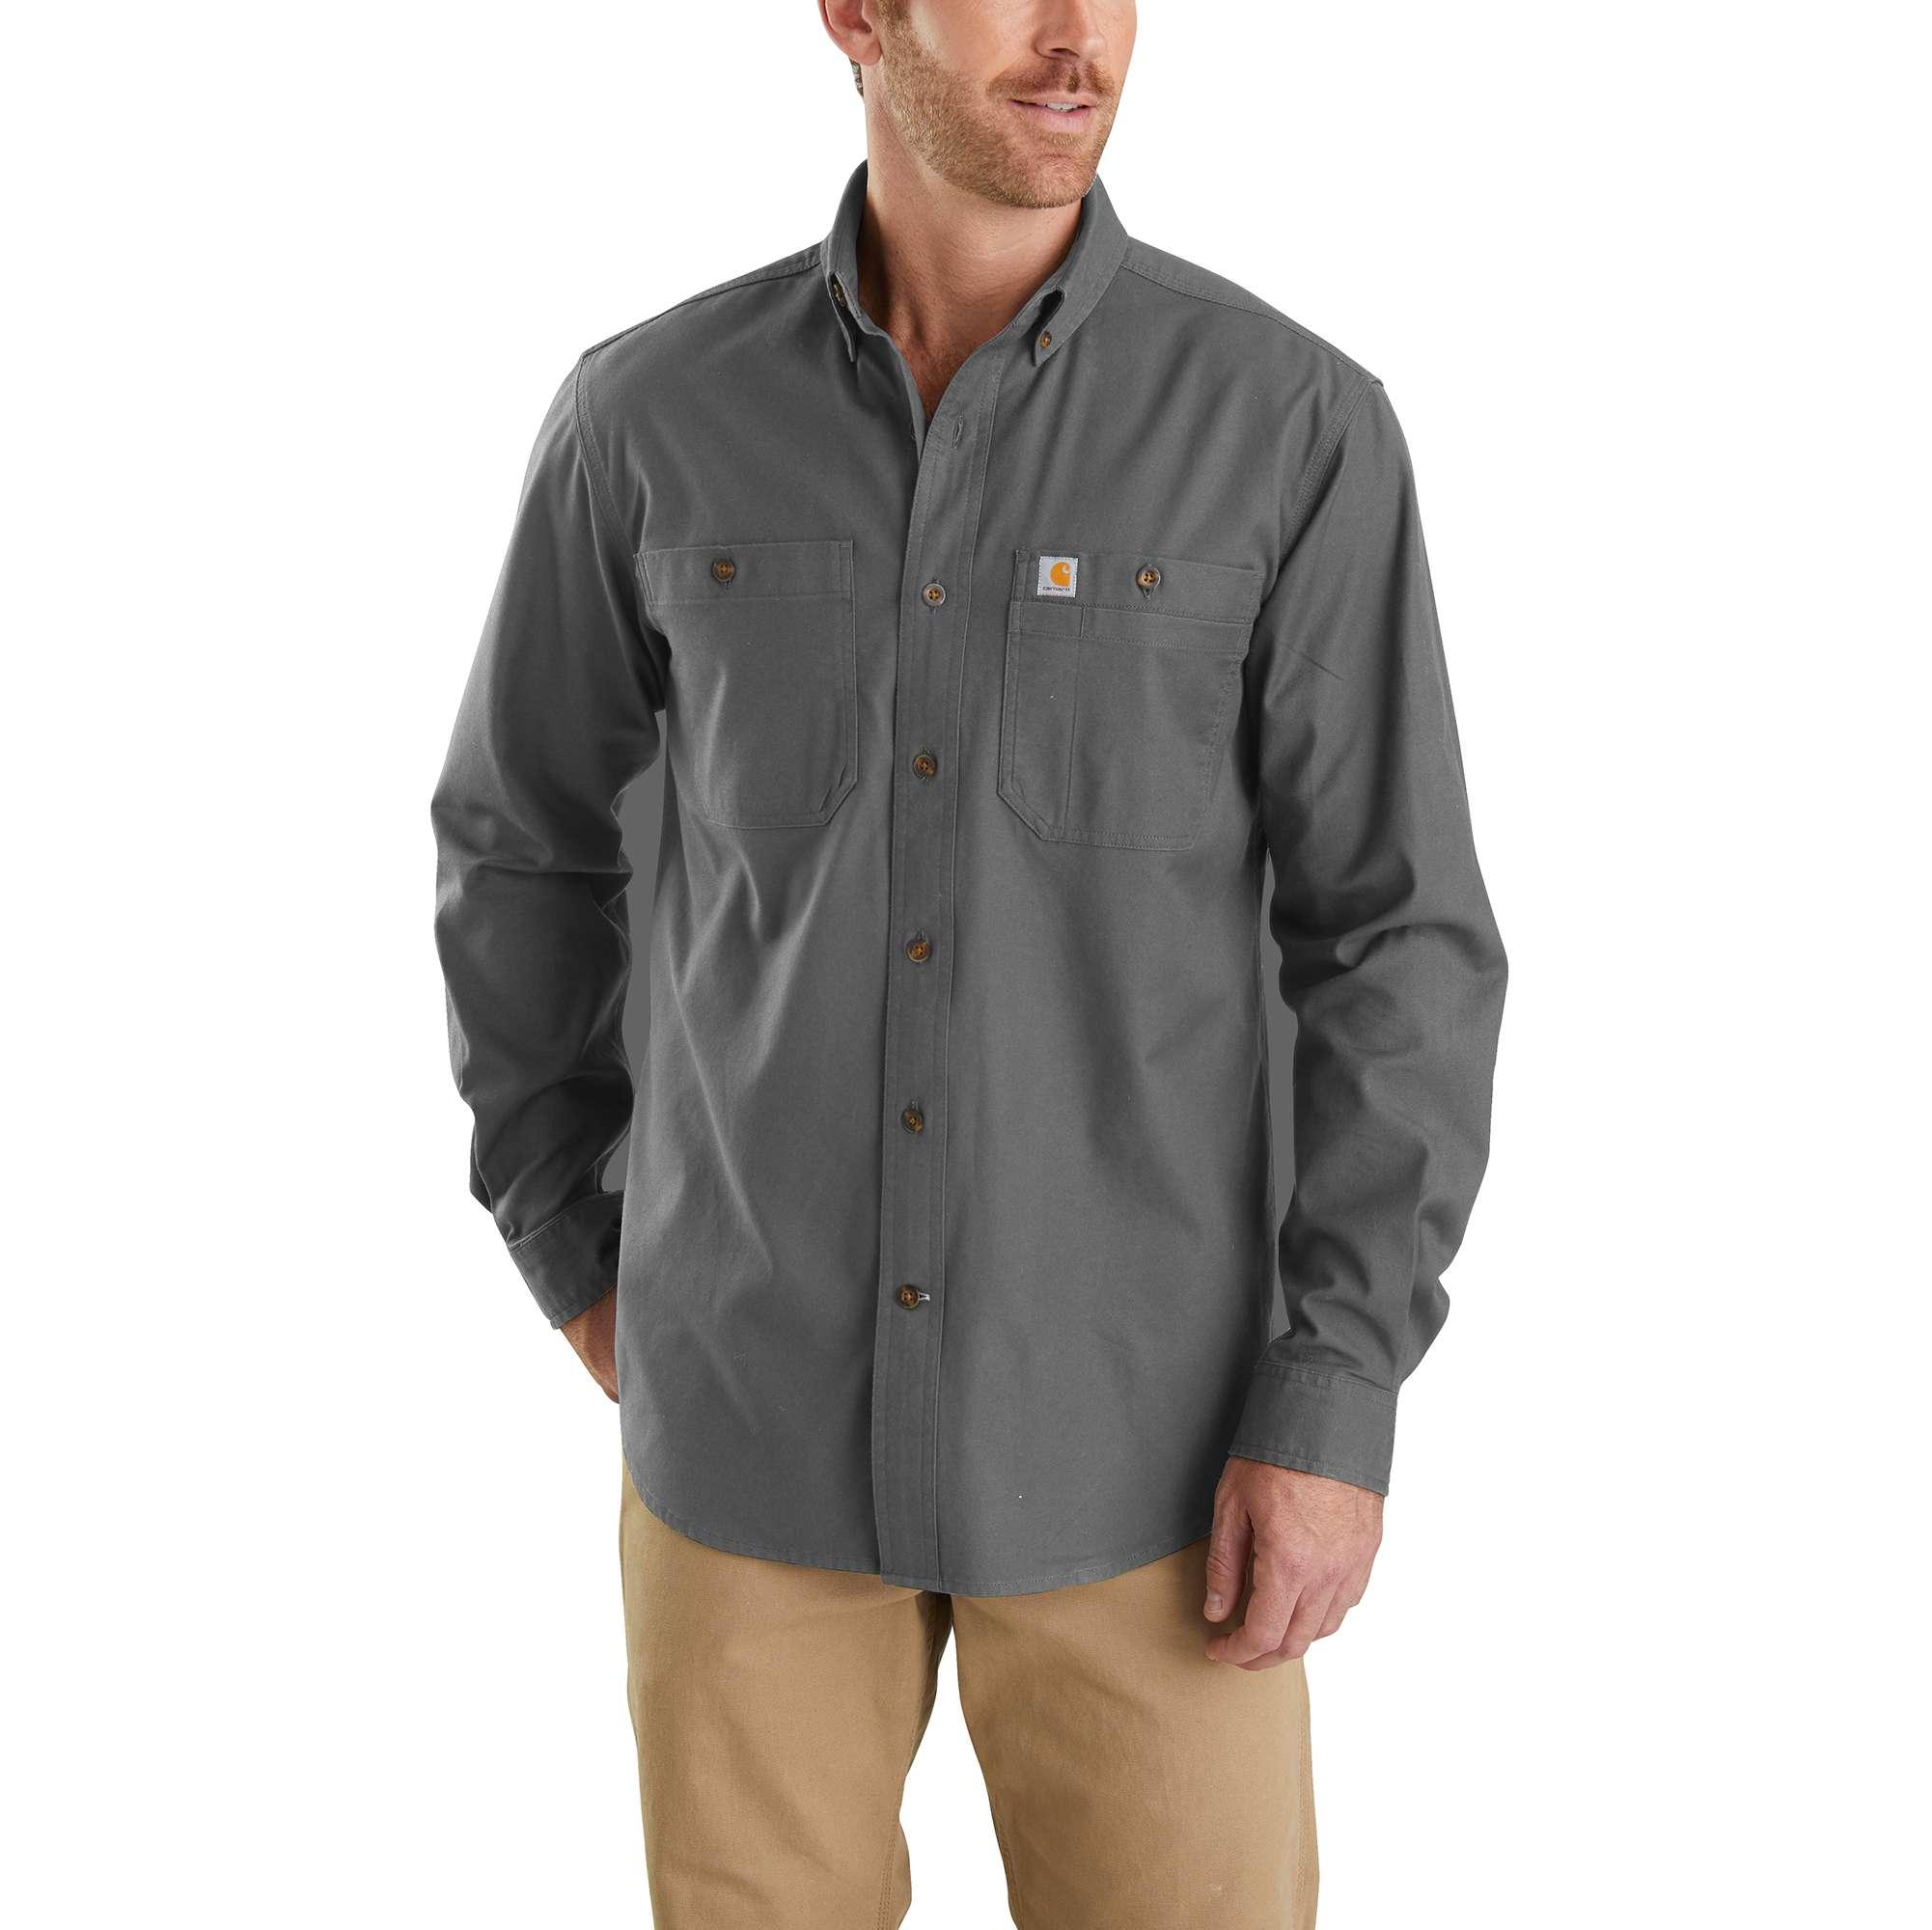 Carhartt Rugged Flex Rigby Long-Sleeve Work Shirt